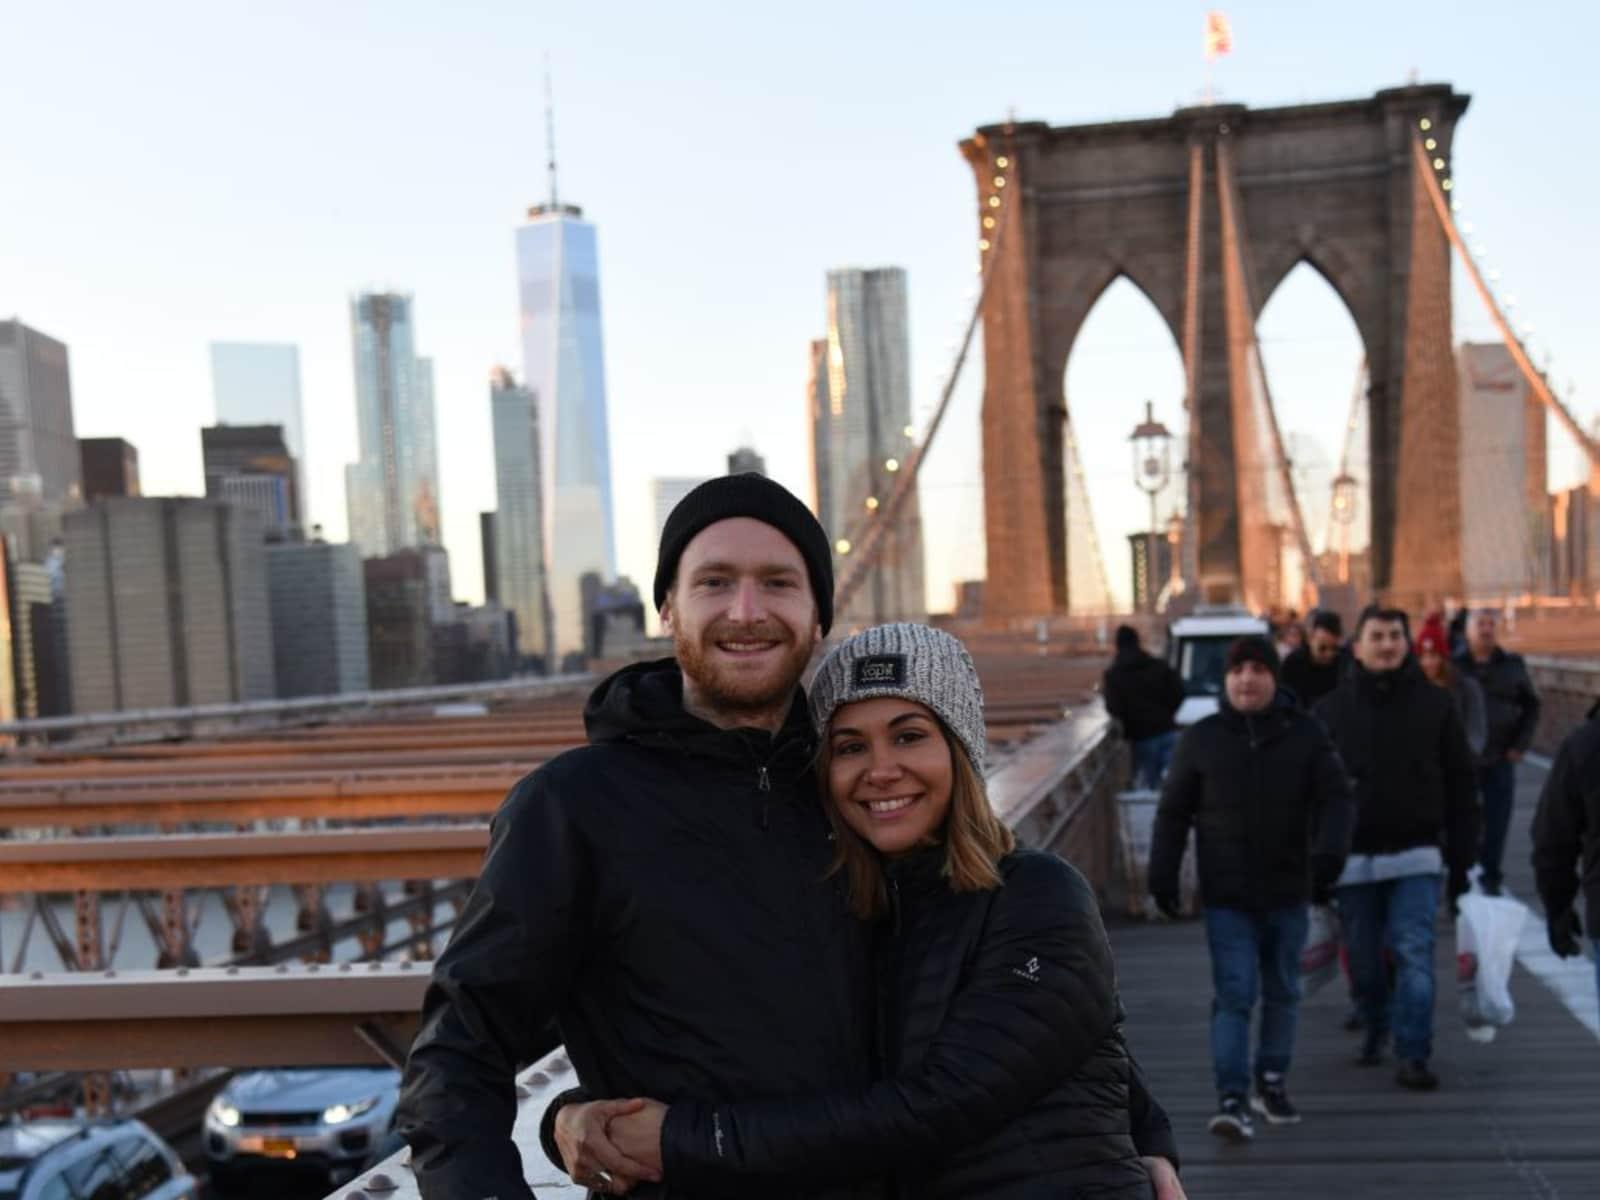 Matthew & Ana from Boston, Massachusetts, United States